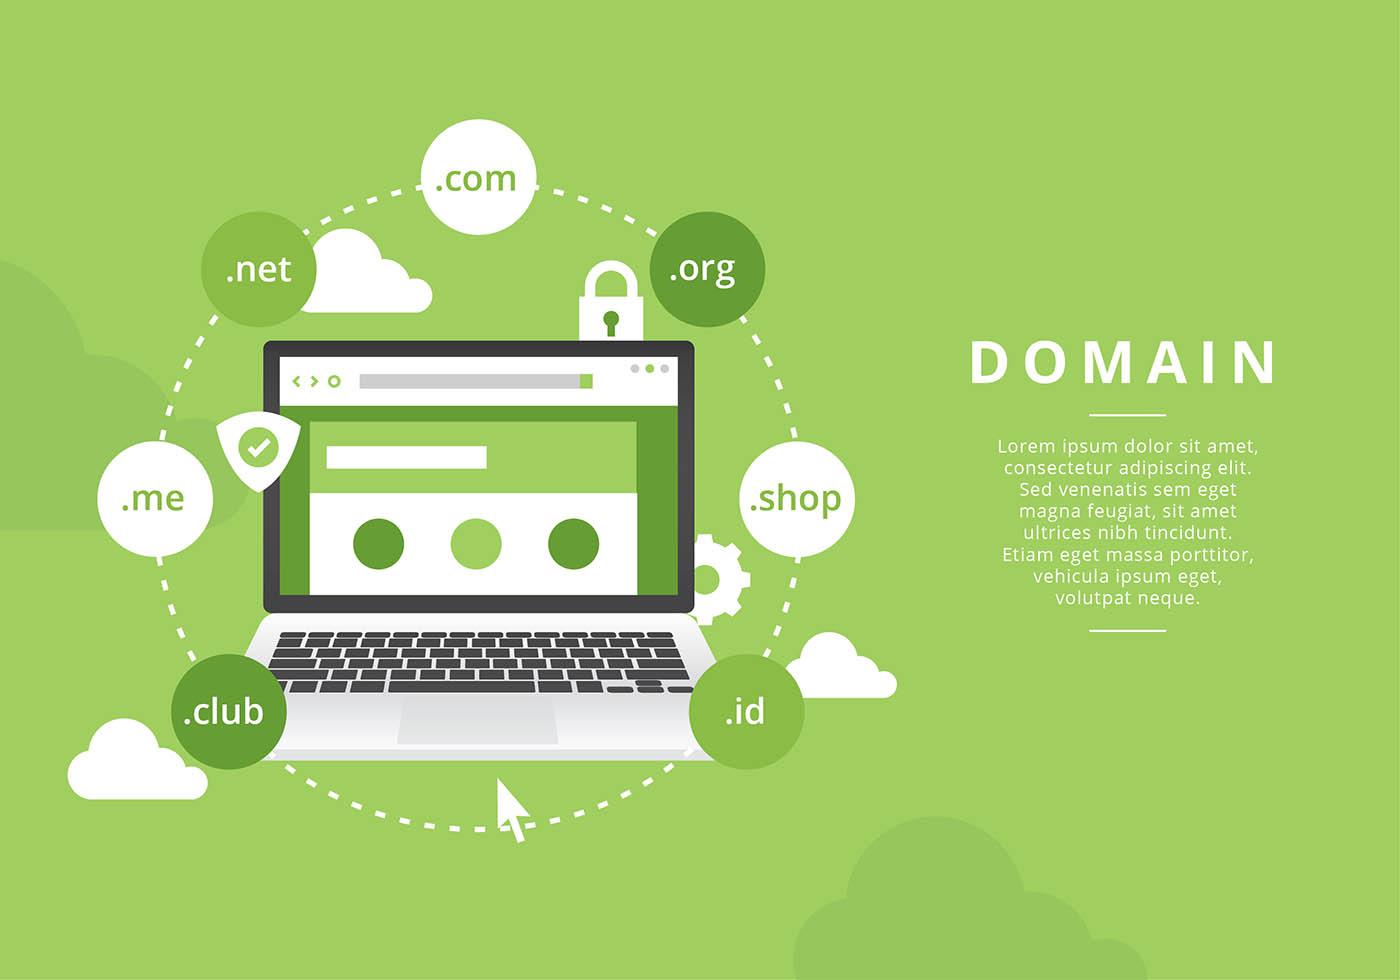 Vector Illustration Web Designs: Website Domain Illustration Free Vector